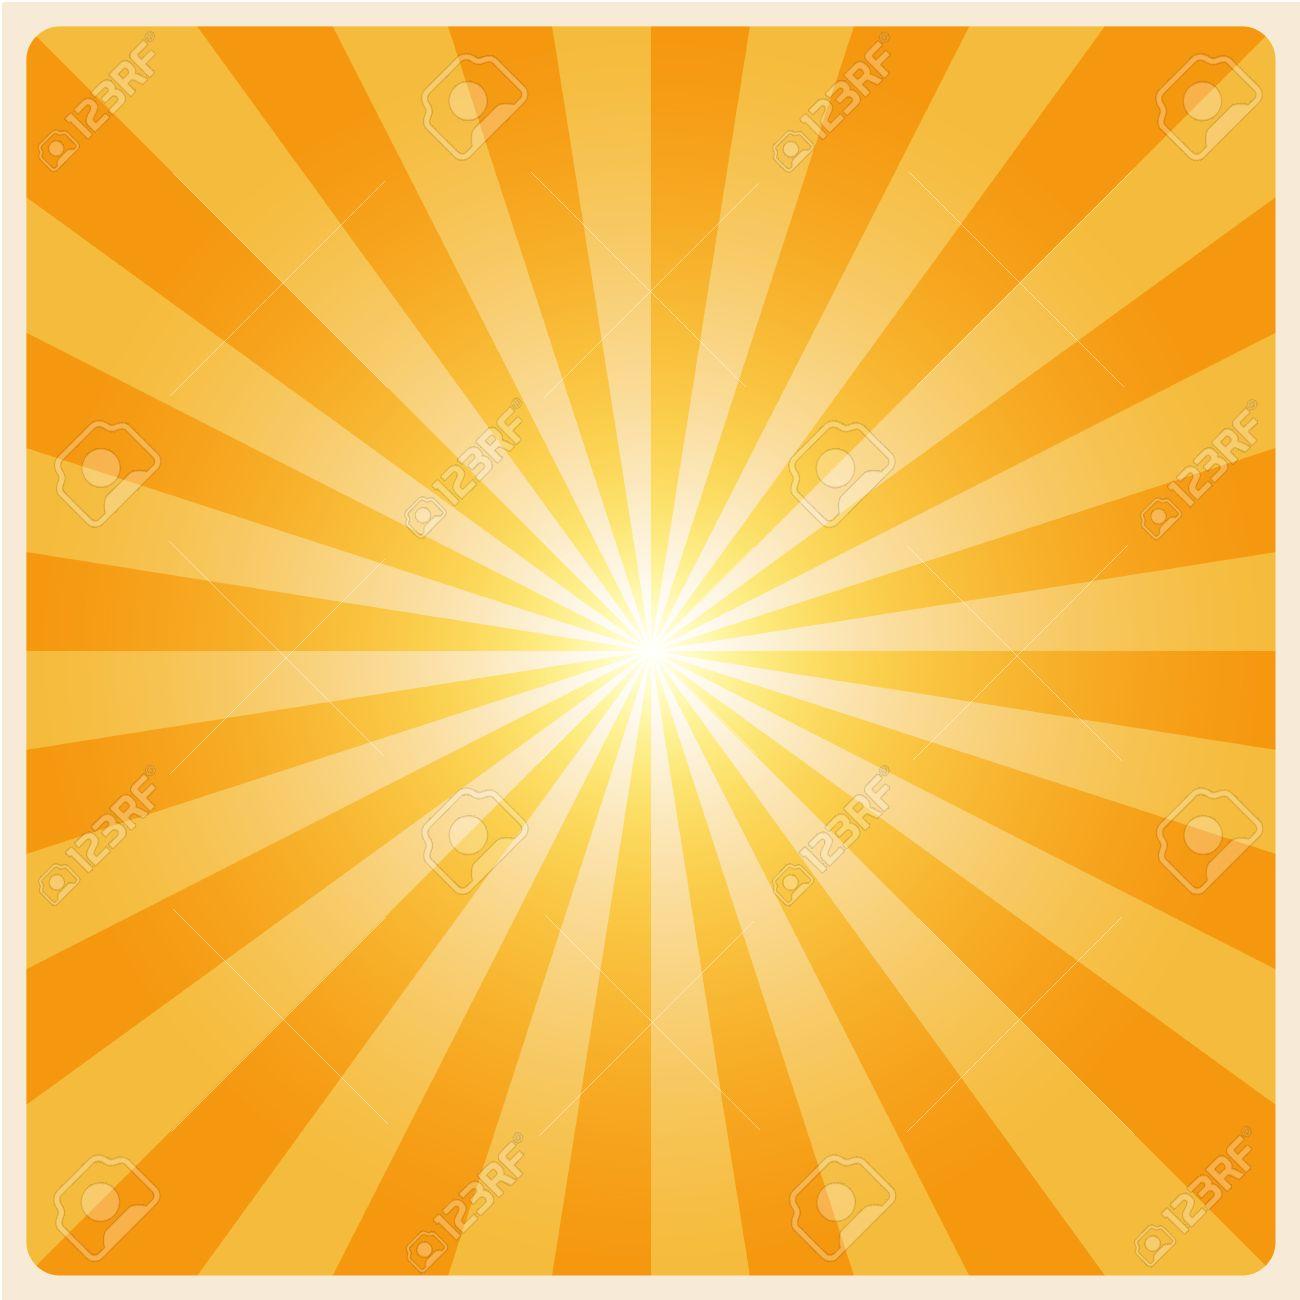 white rays background.Illustratiom EPS10 Stock Vector - 24915207